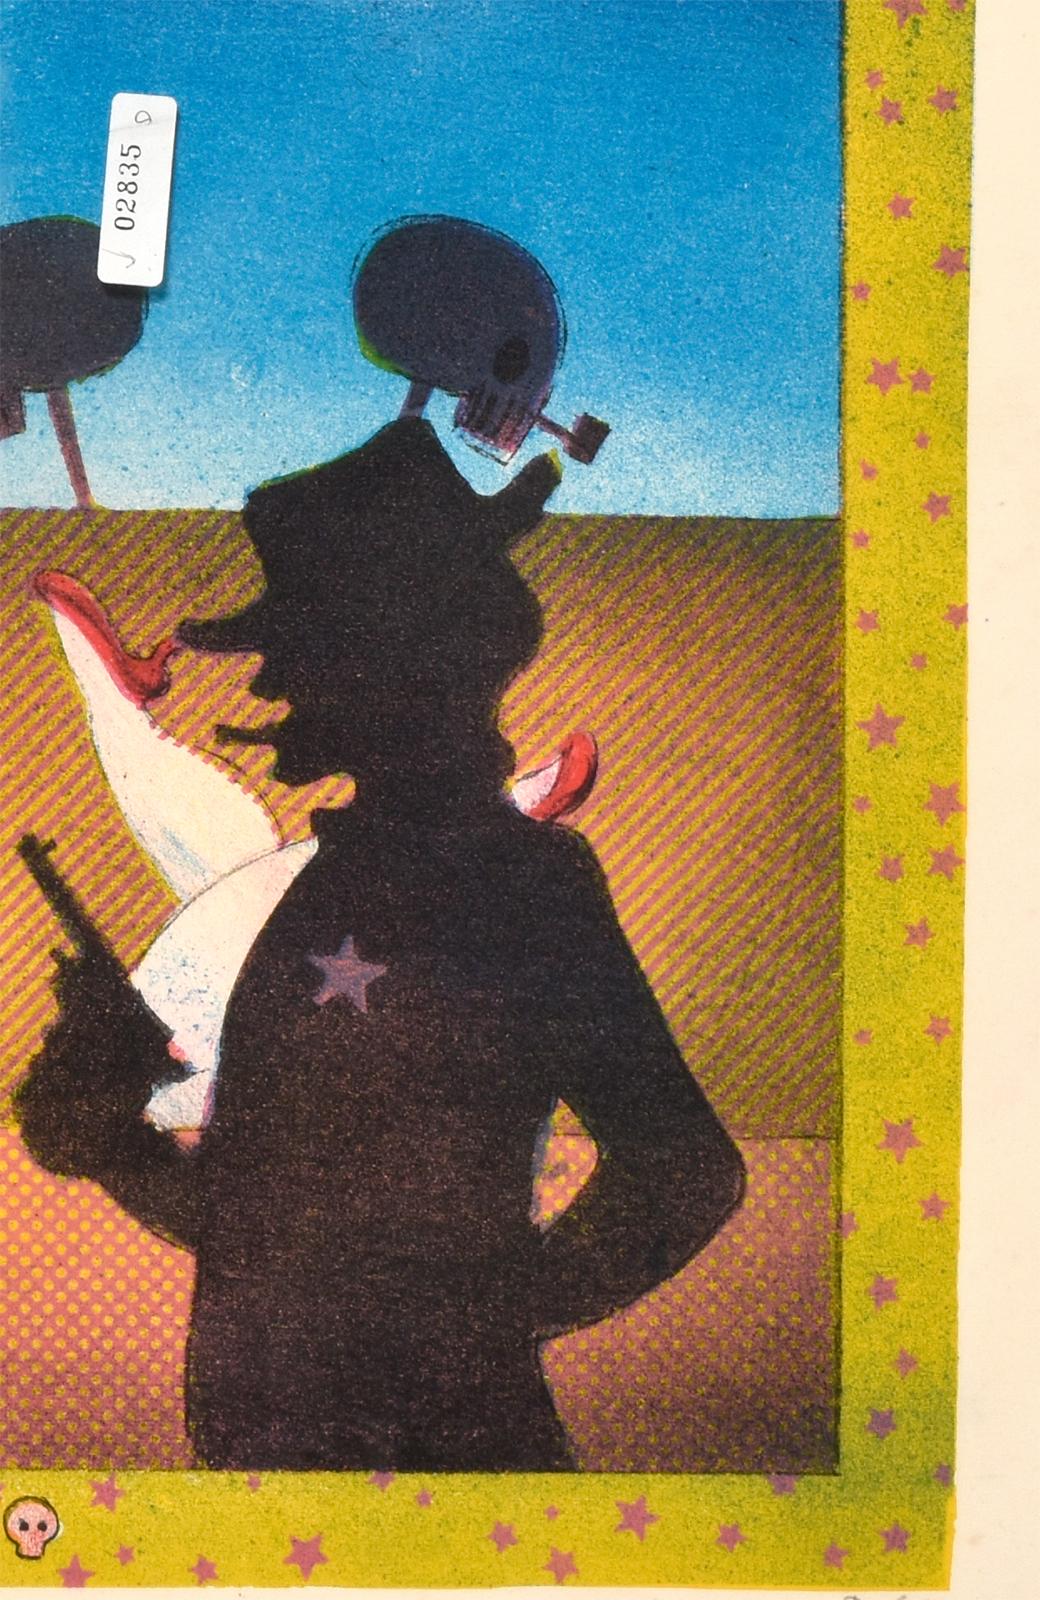 haco! 【アート】馬場檮男 「クレージーキット・3」 <その他>の商品写真7